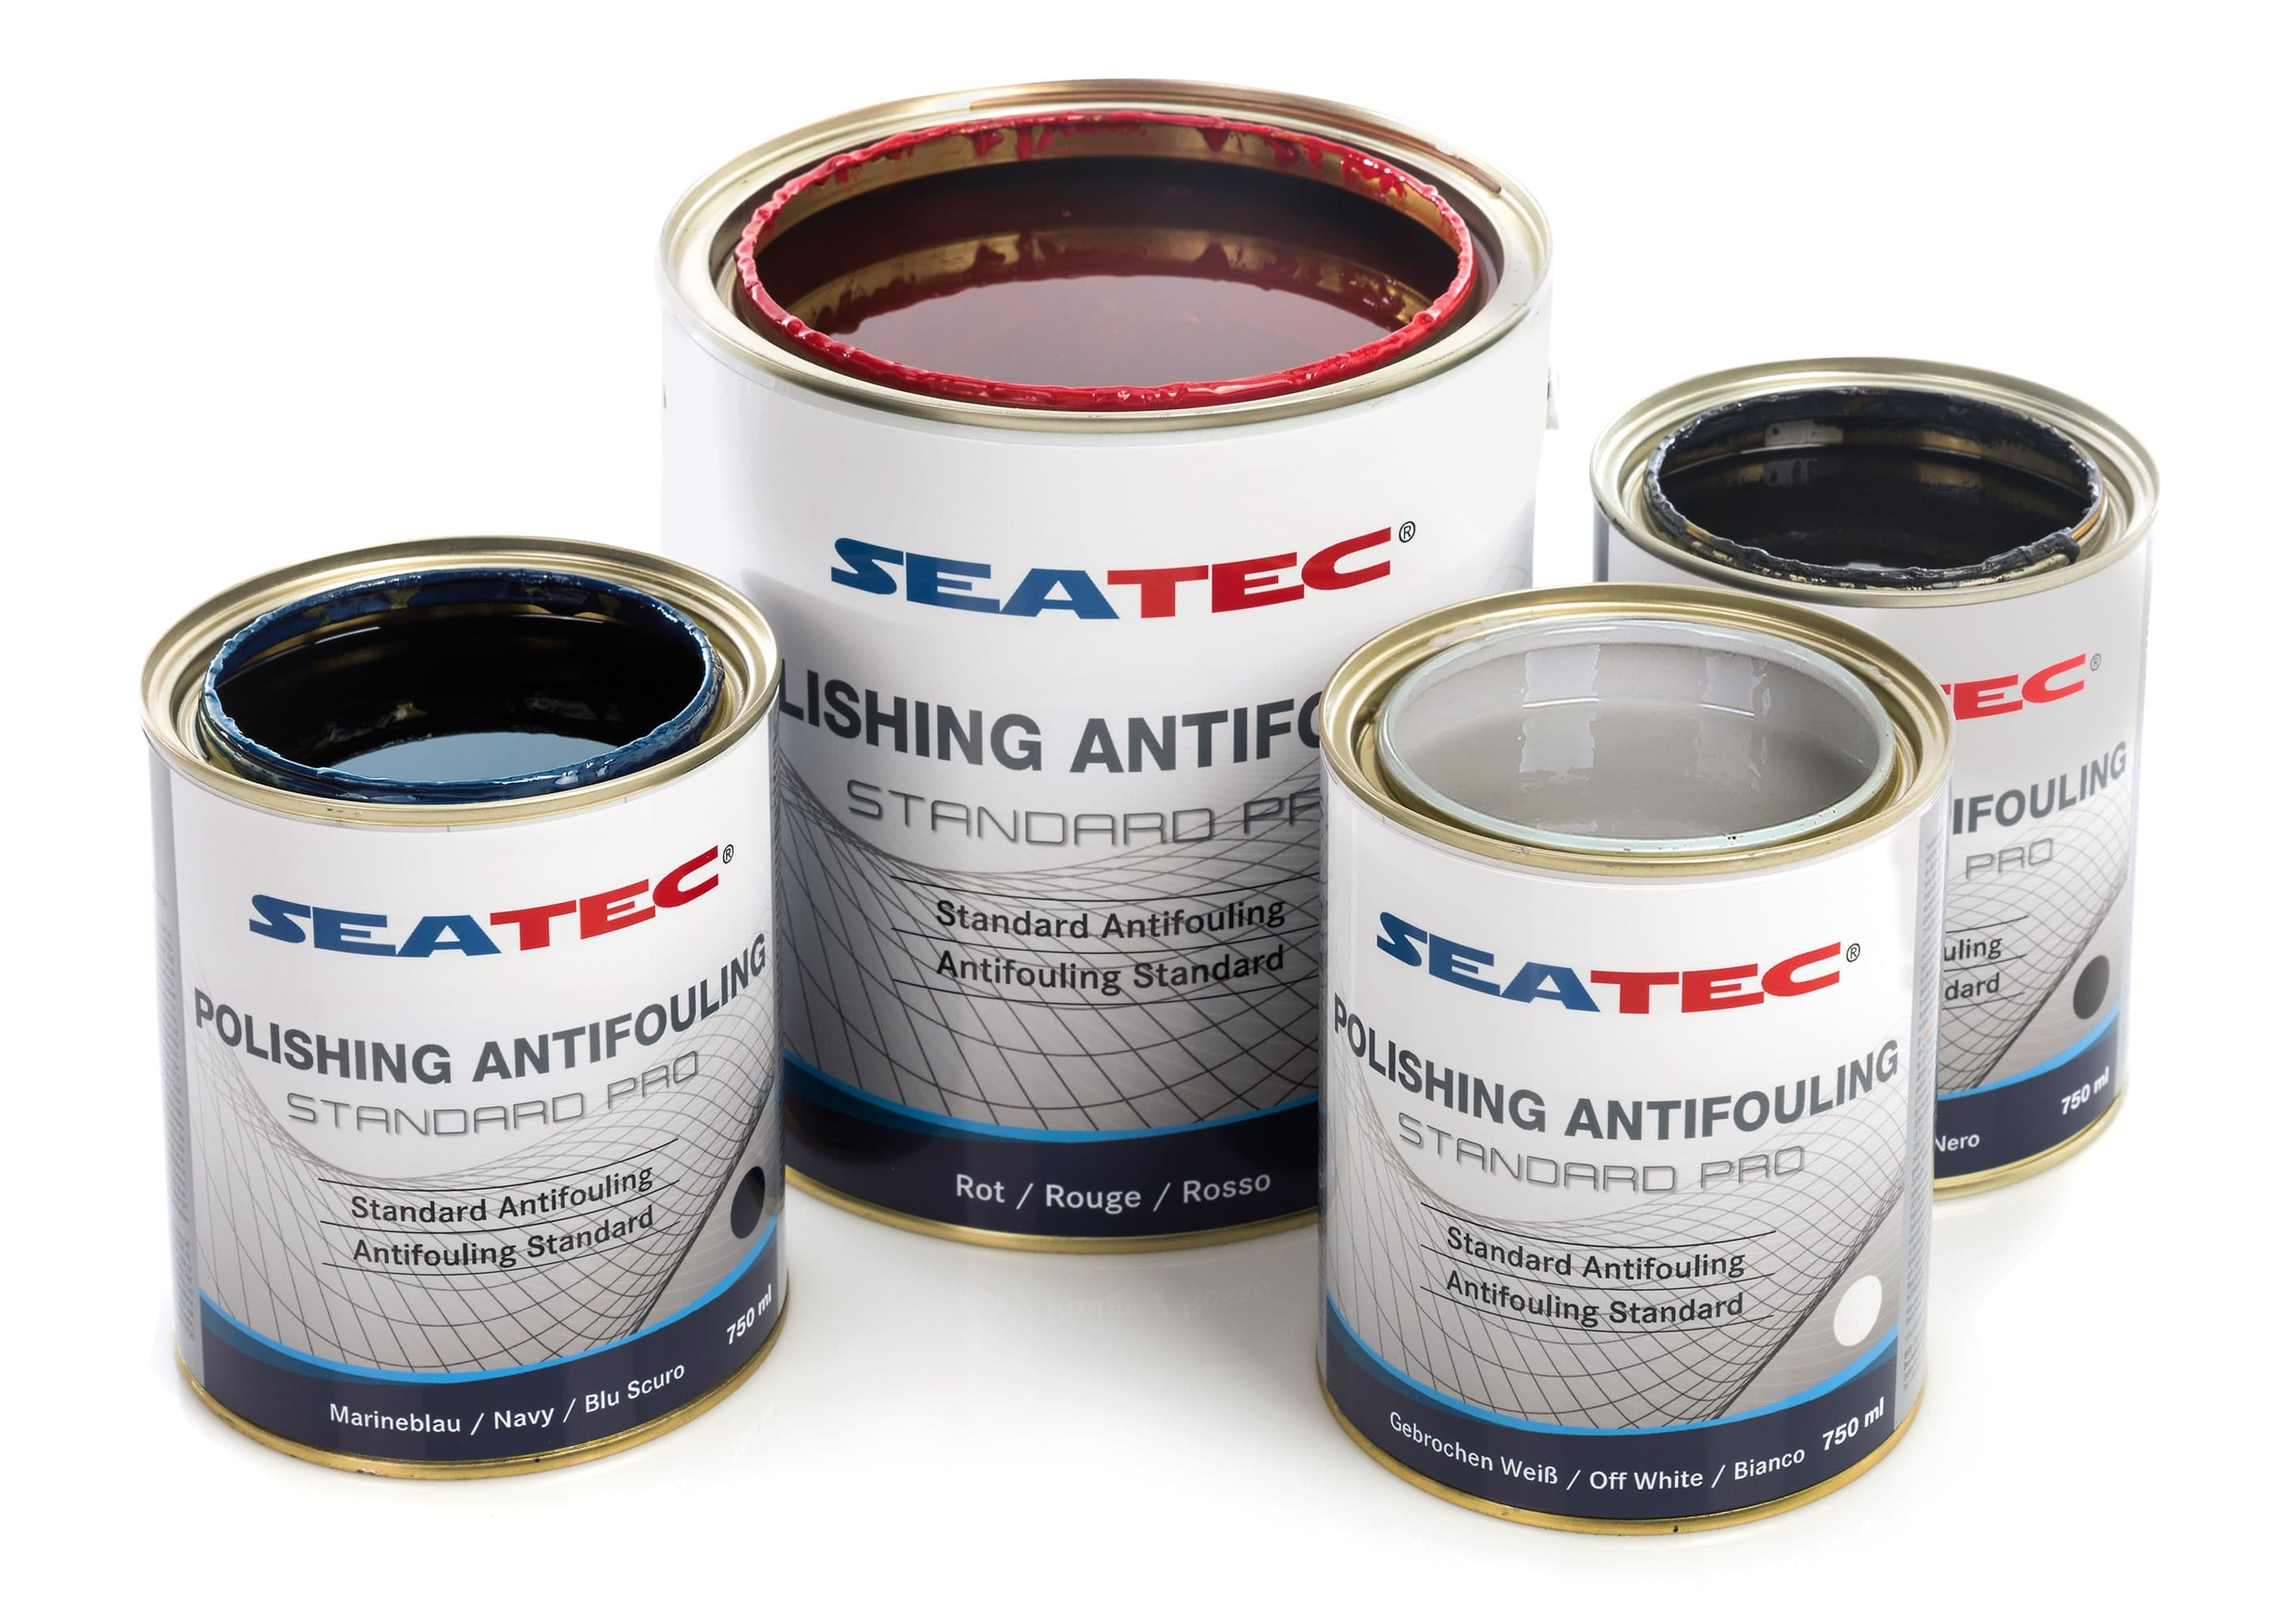 66667_SEATEC_Antifouling_Standard_Pro.jpg